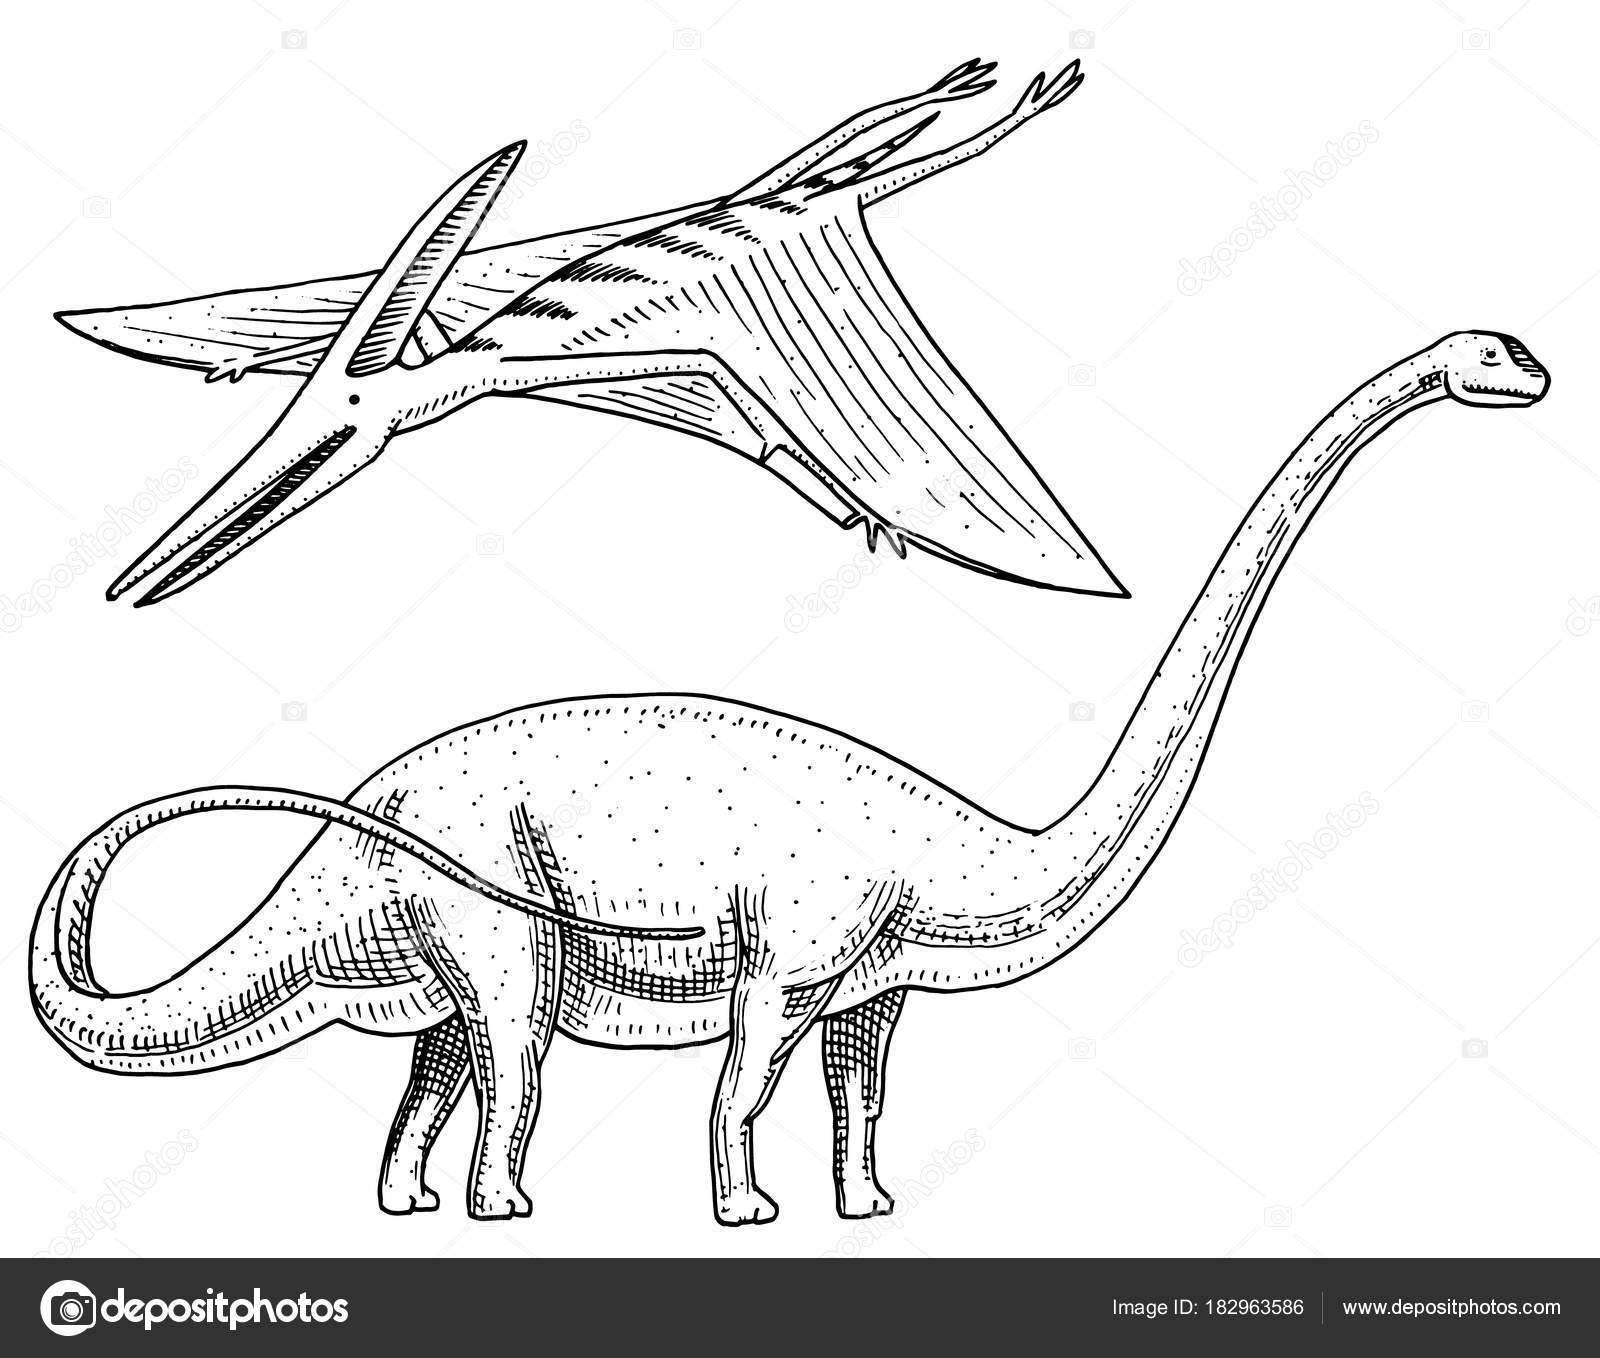 1600x1358 Dinosaur Brachiosaurus Or Sauropod, Plateosaurus, Diplodocus